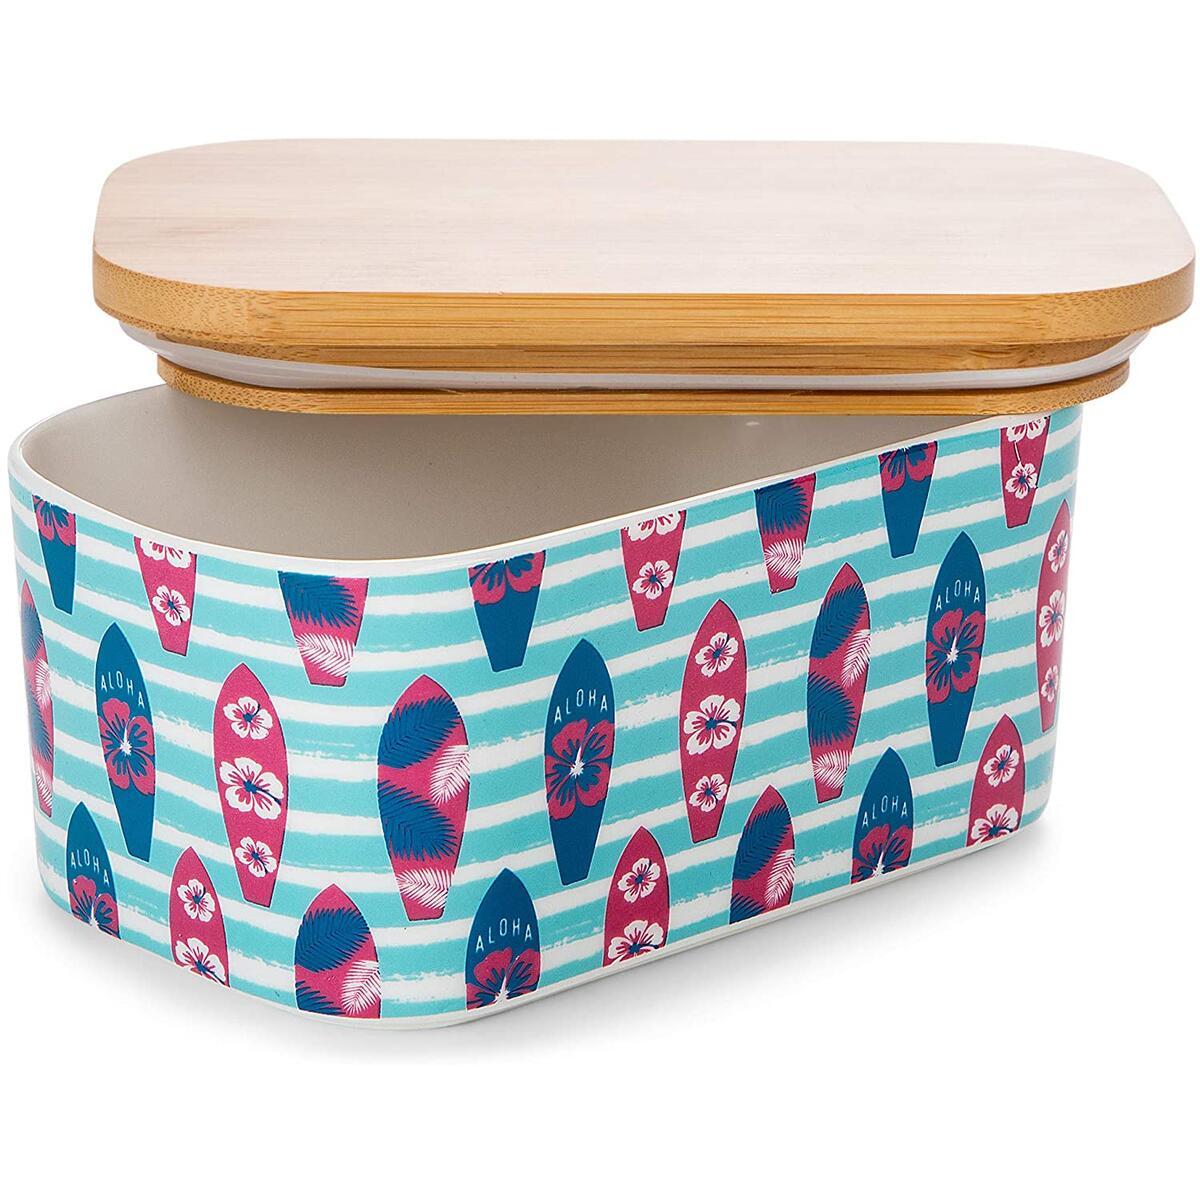 Butter Dish With Lid - Airtight Stick Butter Holder. Porcelain Butter Keeper That Fits 2 Sticks